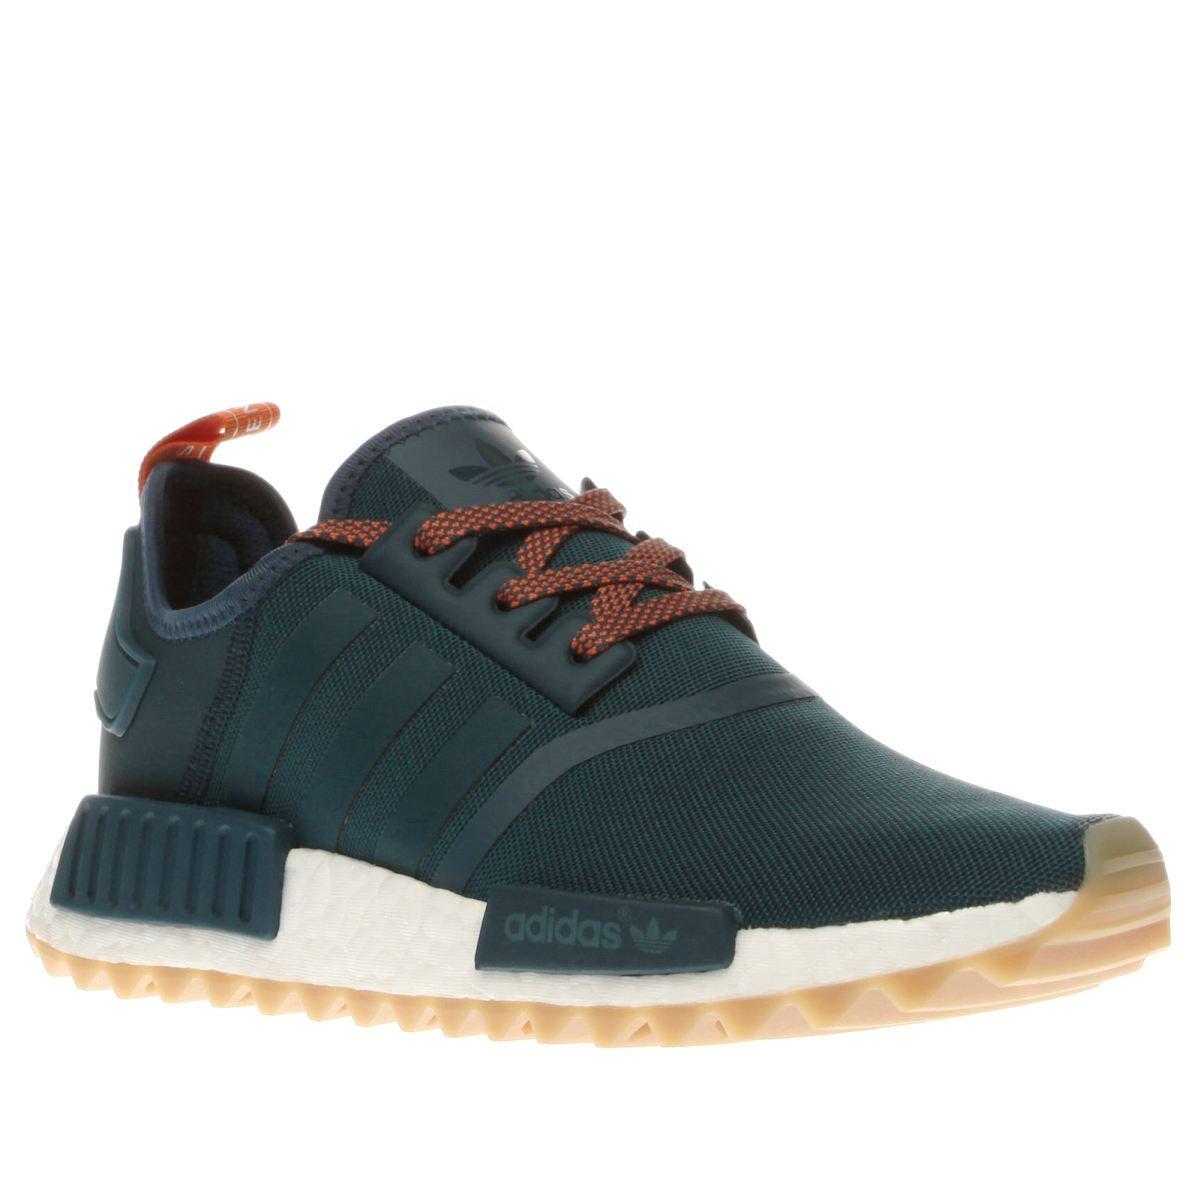 ada5ca8b7 womens adidas turquoise nmd-r1 trail trainers